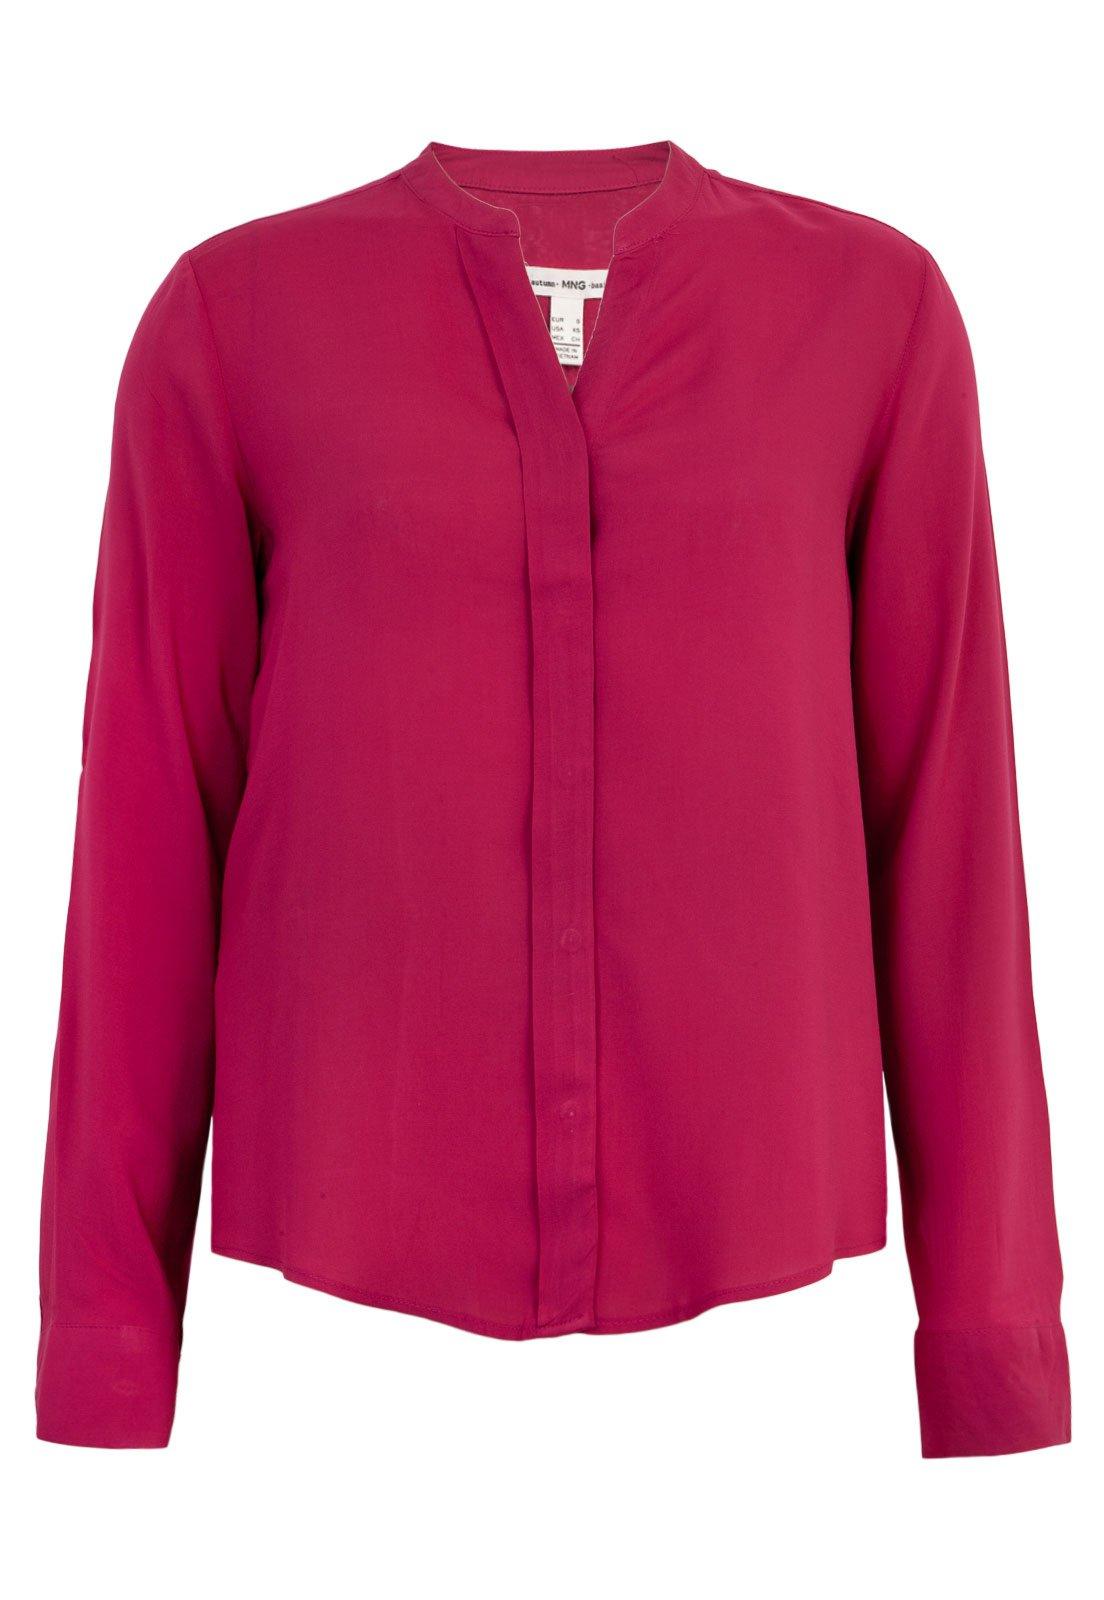 Camisa Mng Barcelona Rosa Compre Agora Dafiti Brasil